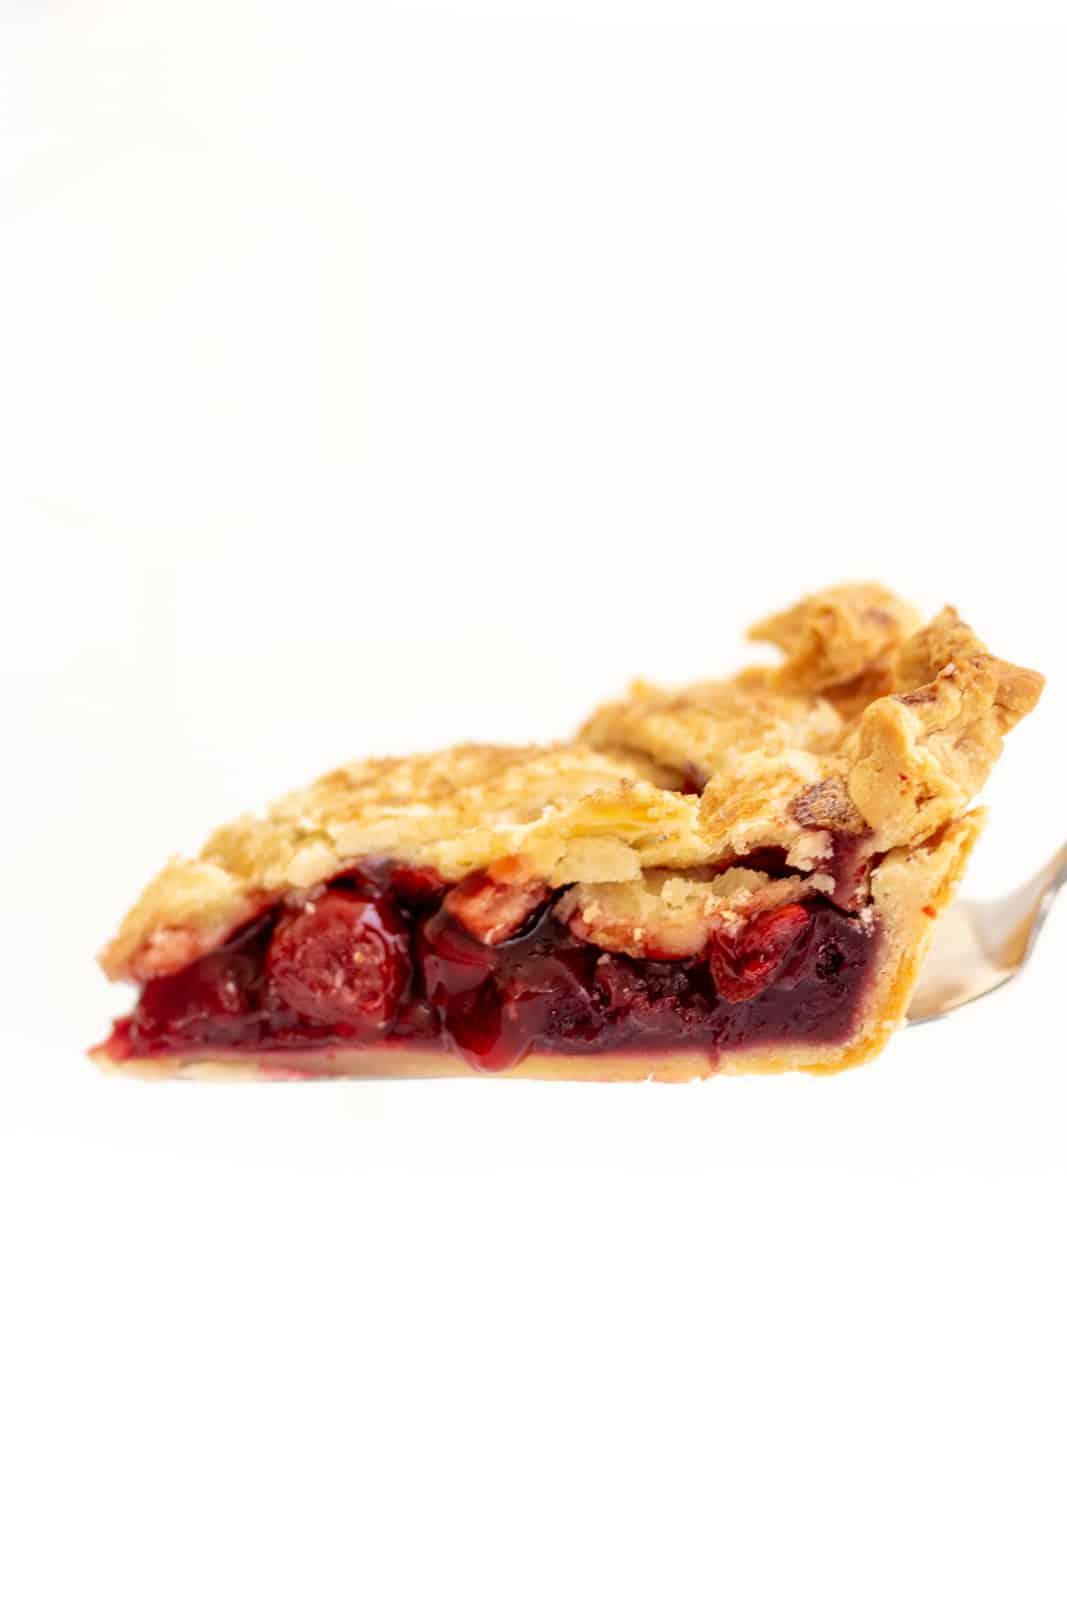 Slice of pie on pie server being held up